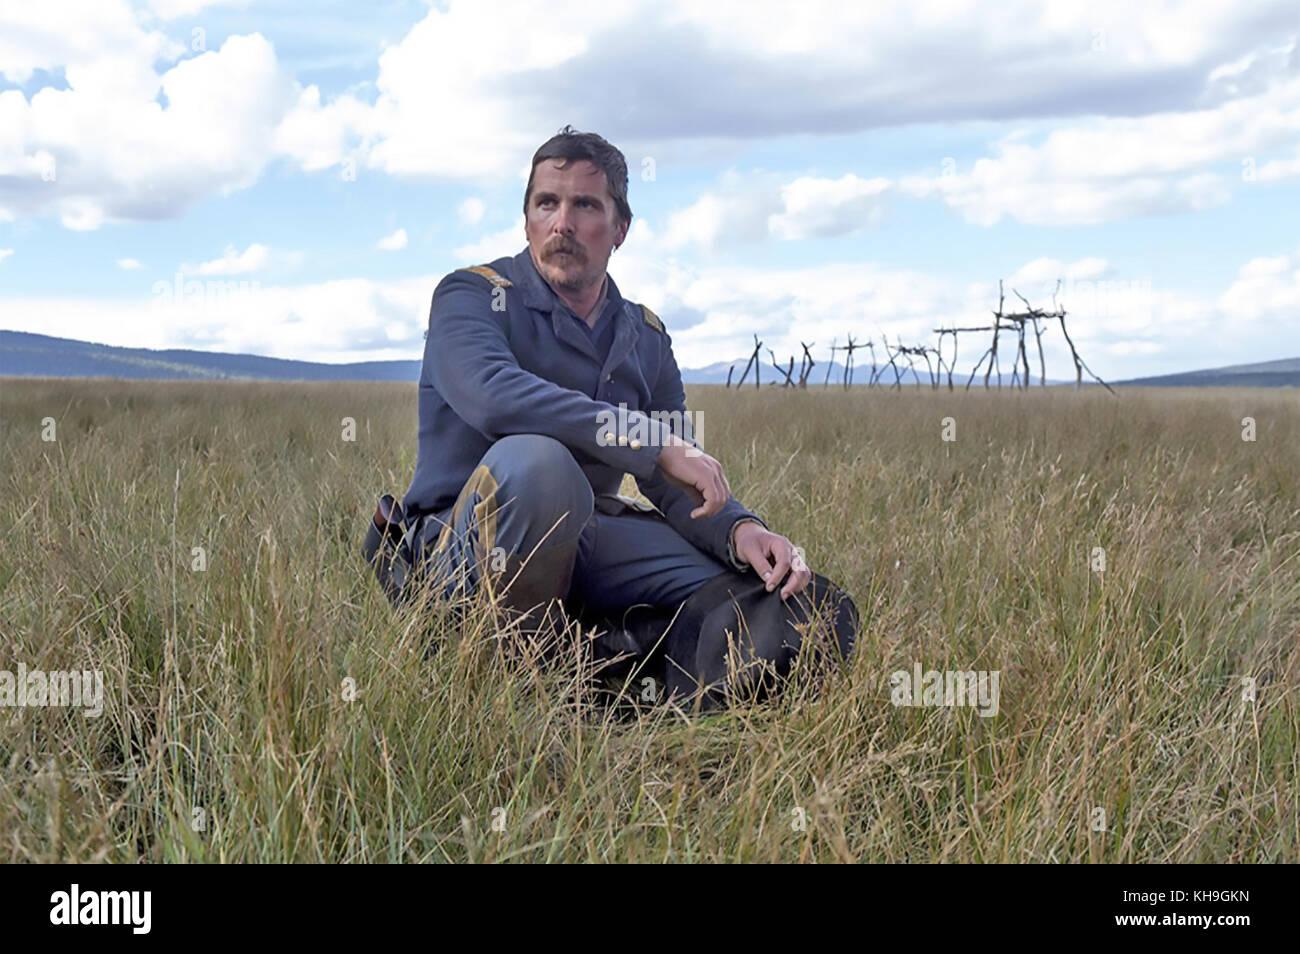 Feinde 2017 Entertainment Studios Film mit Christian Bale Stockbild